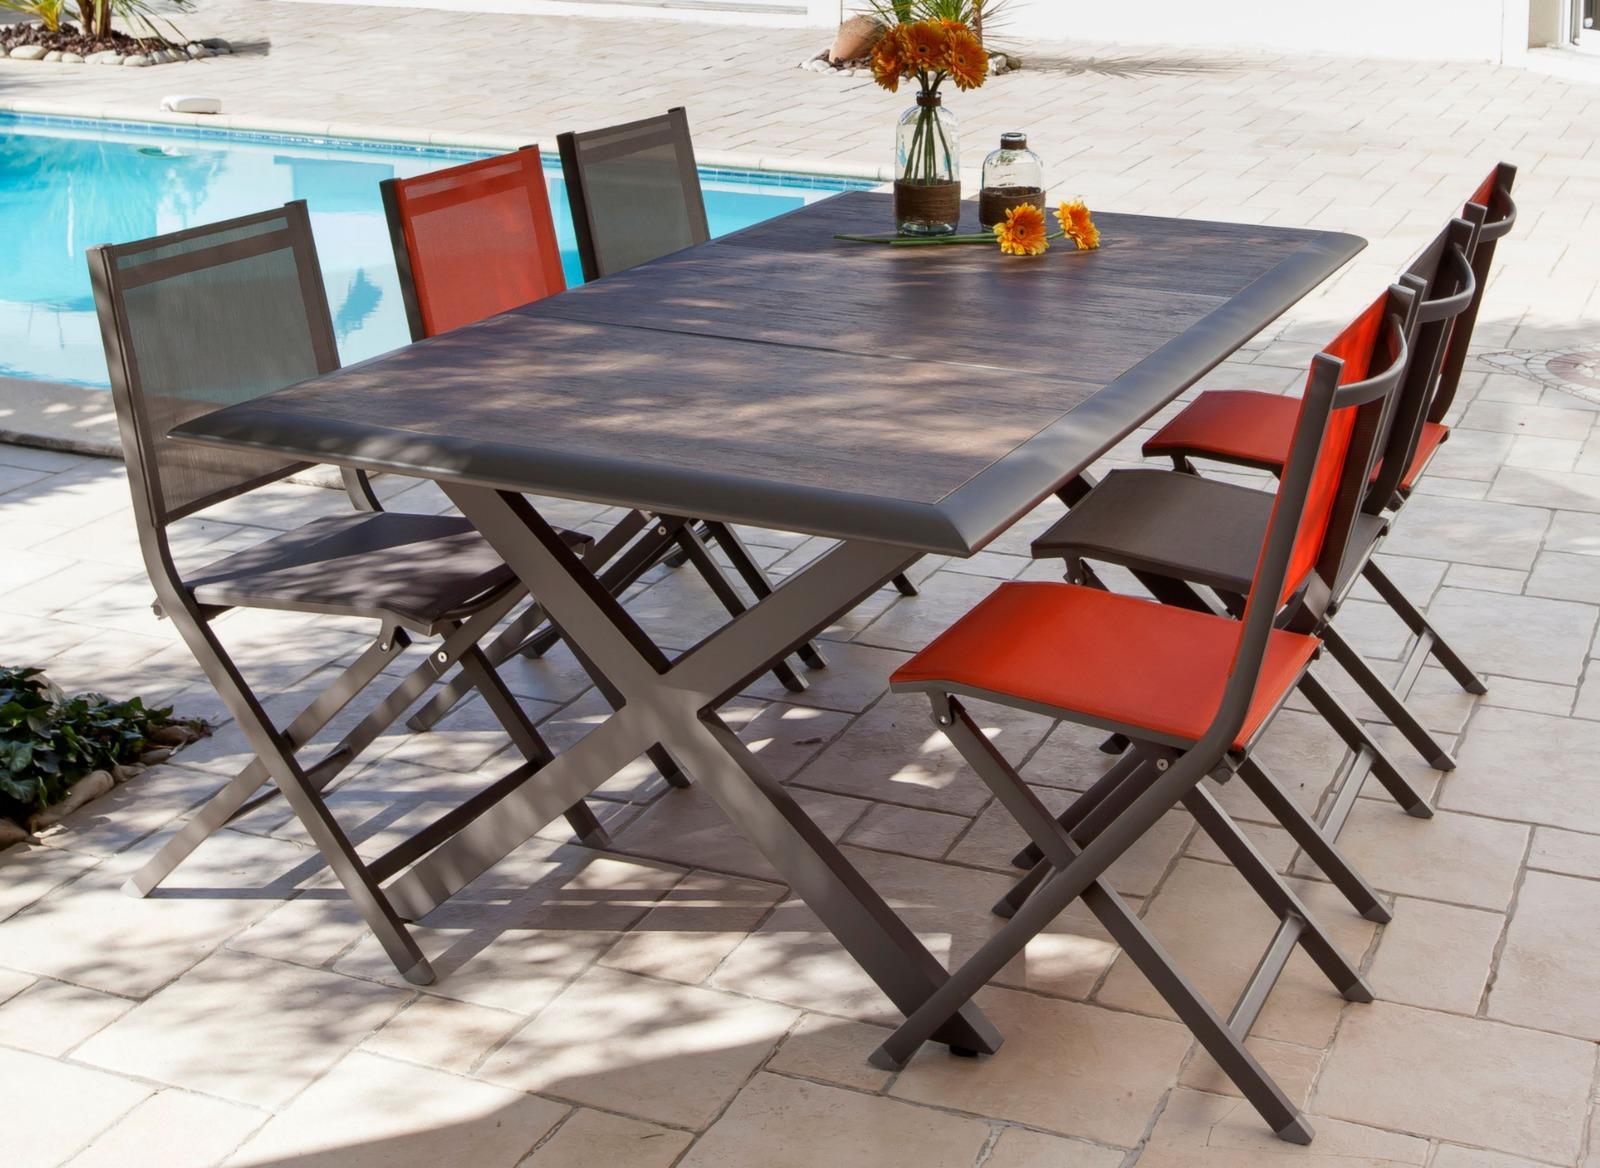 Table de jardin style atelier Céram 198cm - Gamme Alizé - Proloisirs